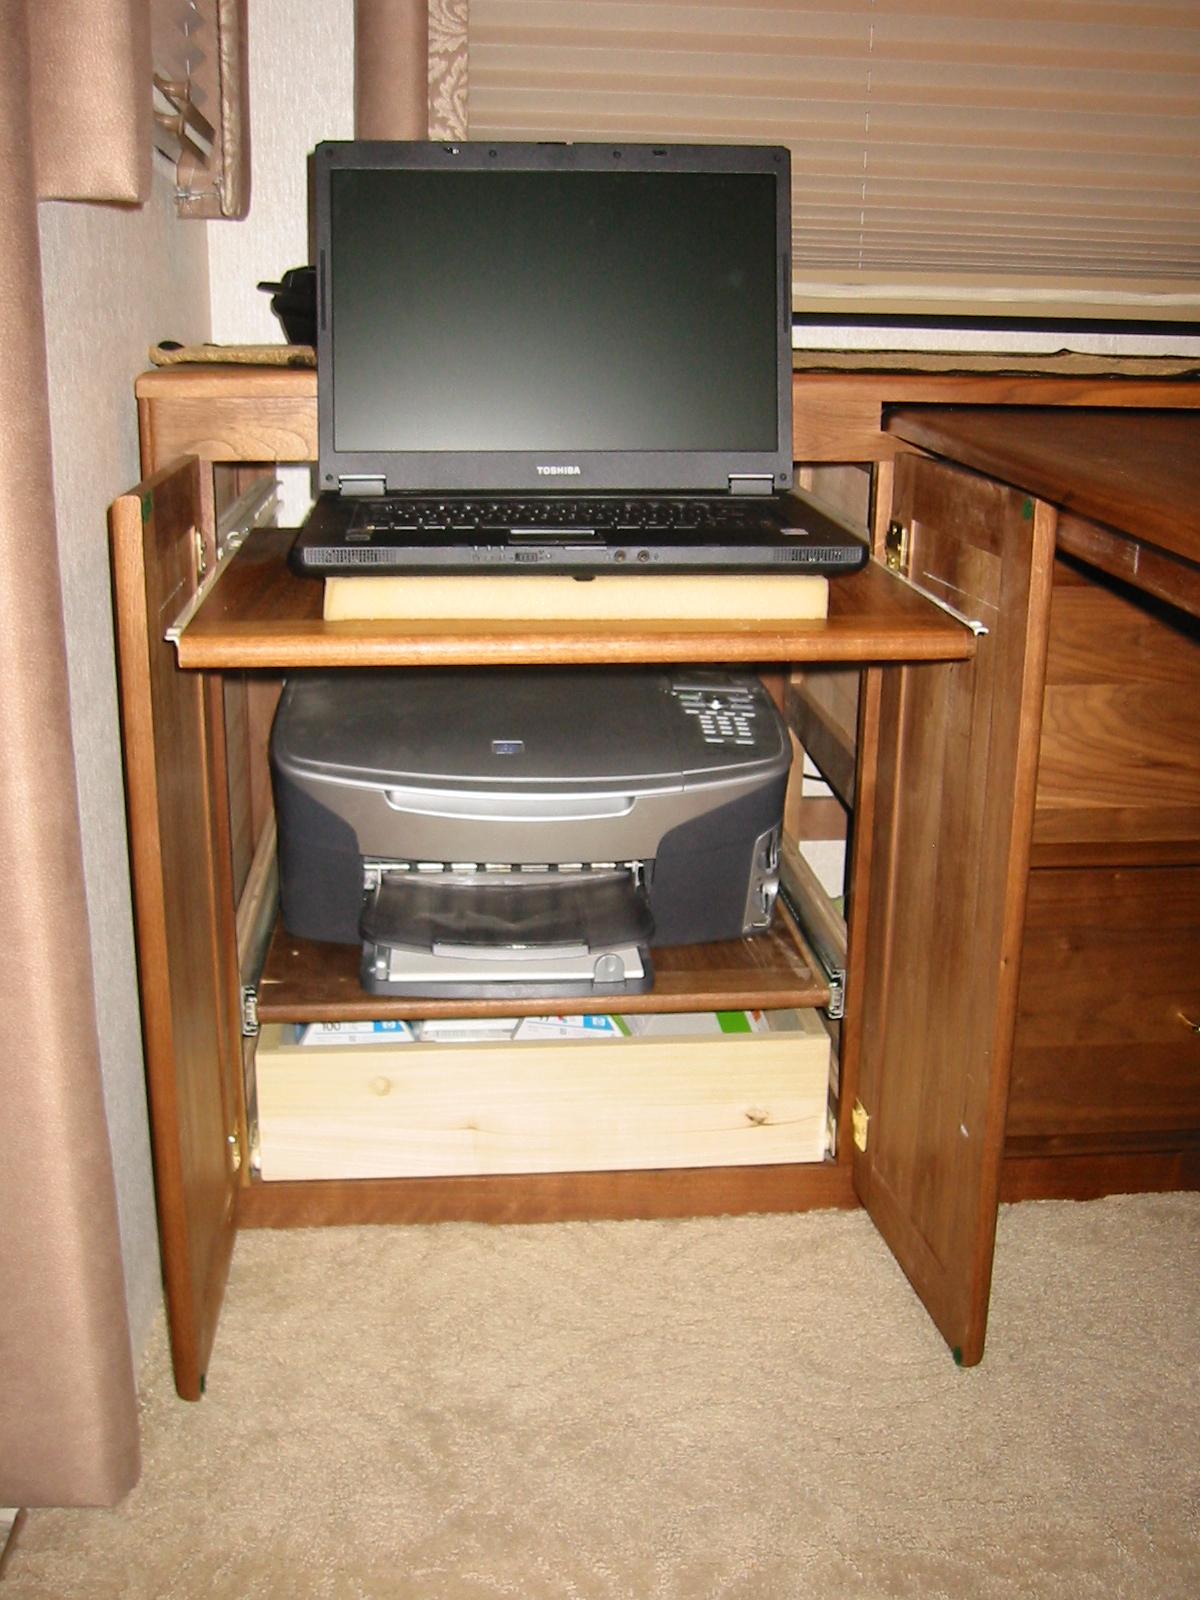 Click image for larger version  Name:RV Desk 2.jpg Views:758 Size:868.9 KB ID:26397